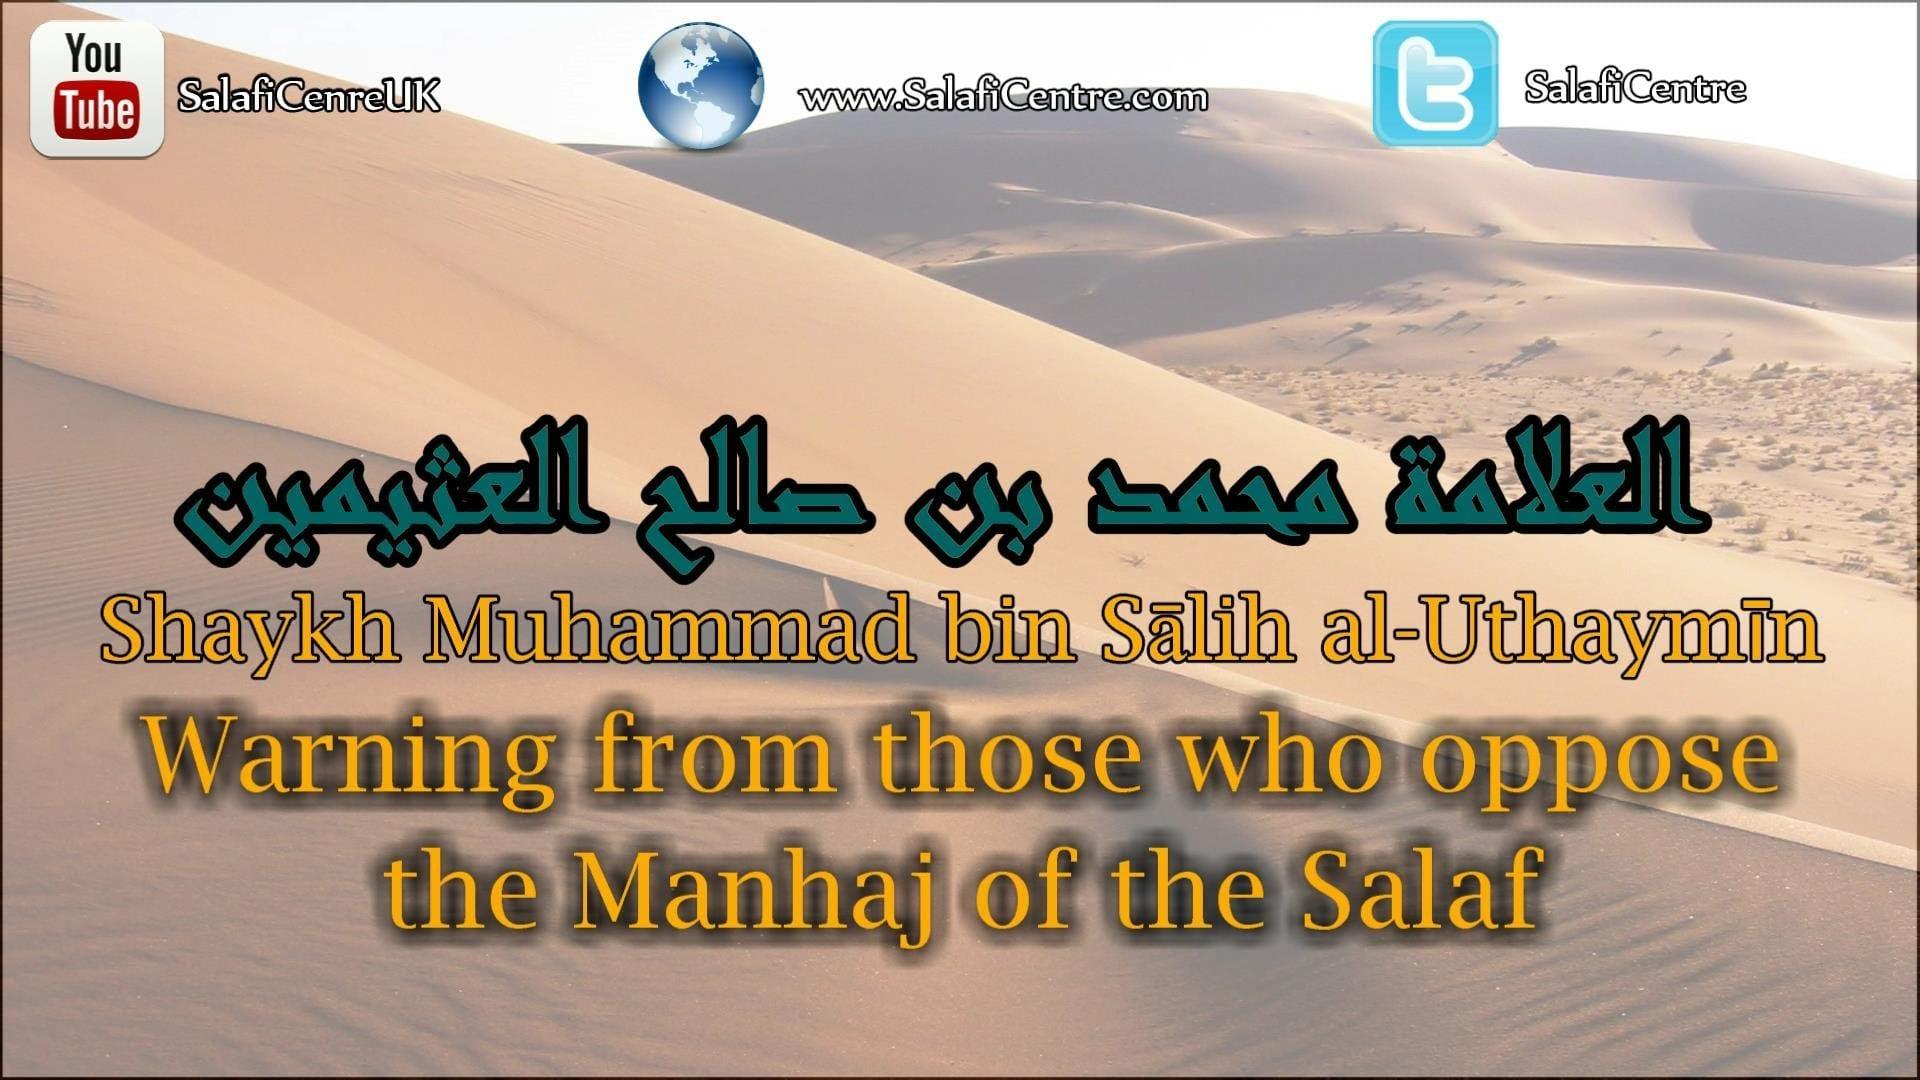 Warning from those who oppose the Manhaj of the Salaf   Shaykh Muhammad bin Sālih al-Uthaymīn